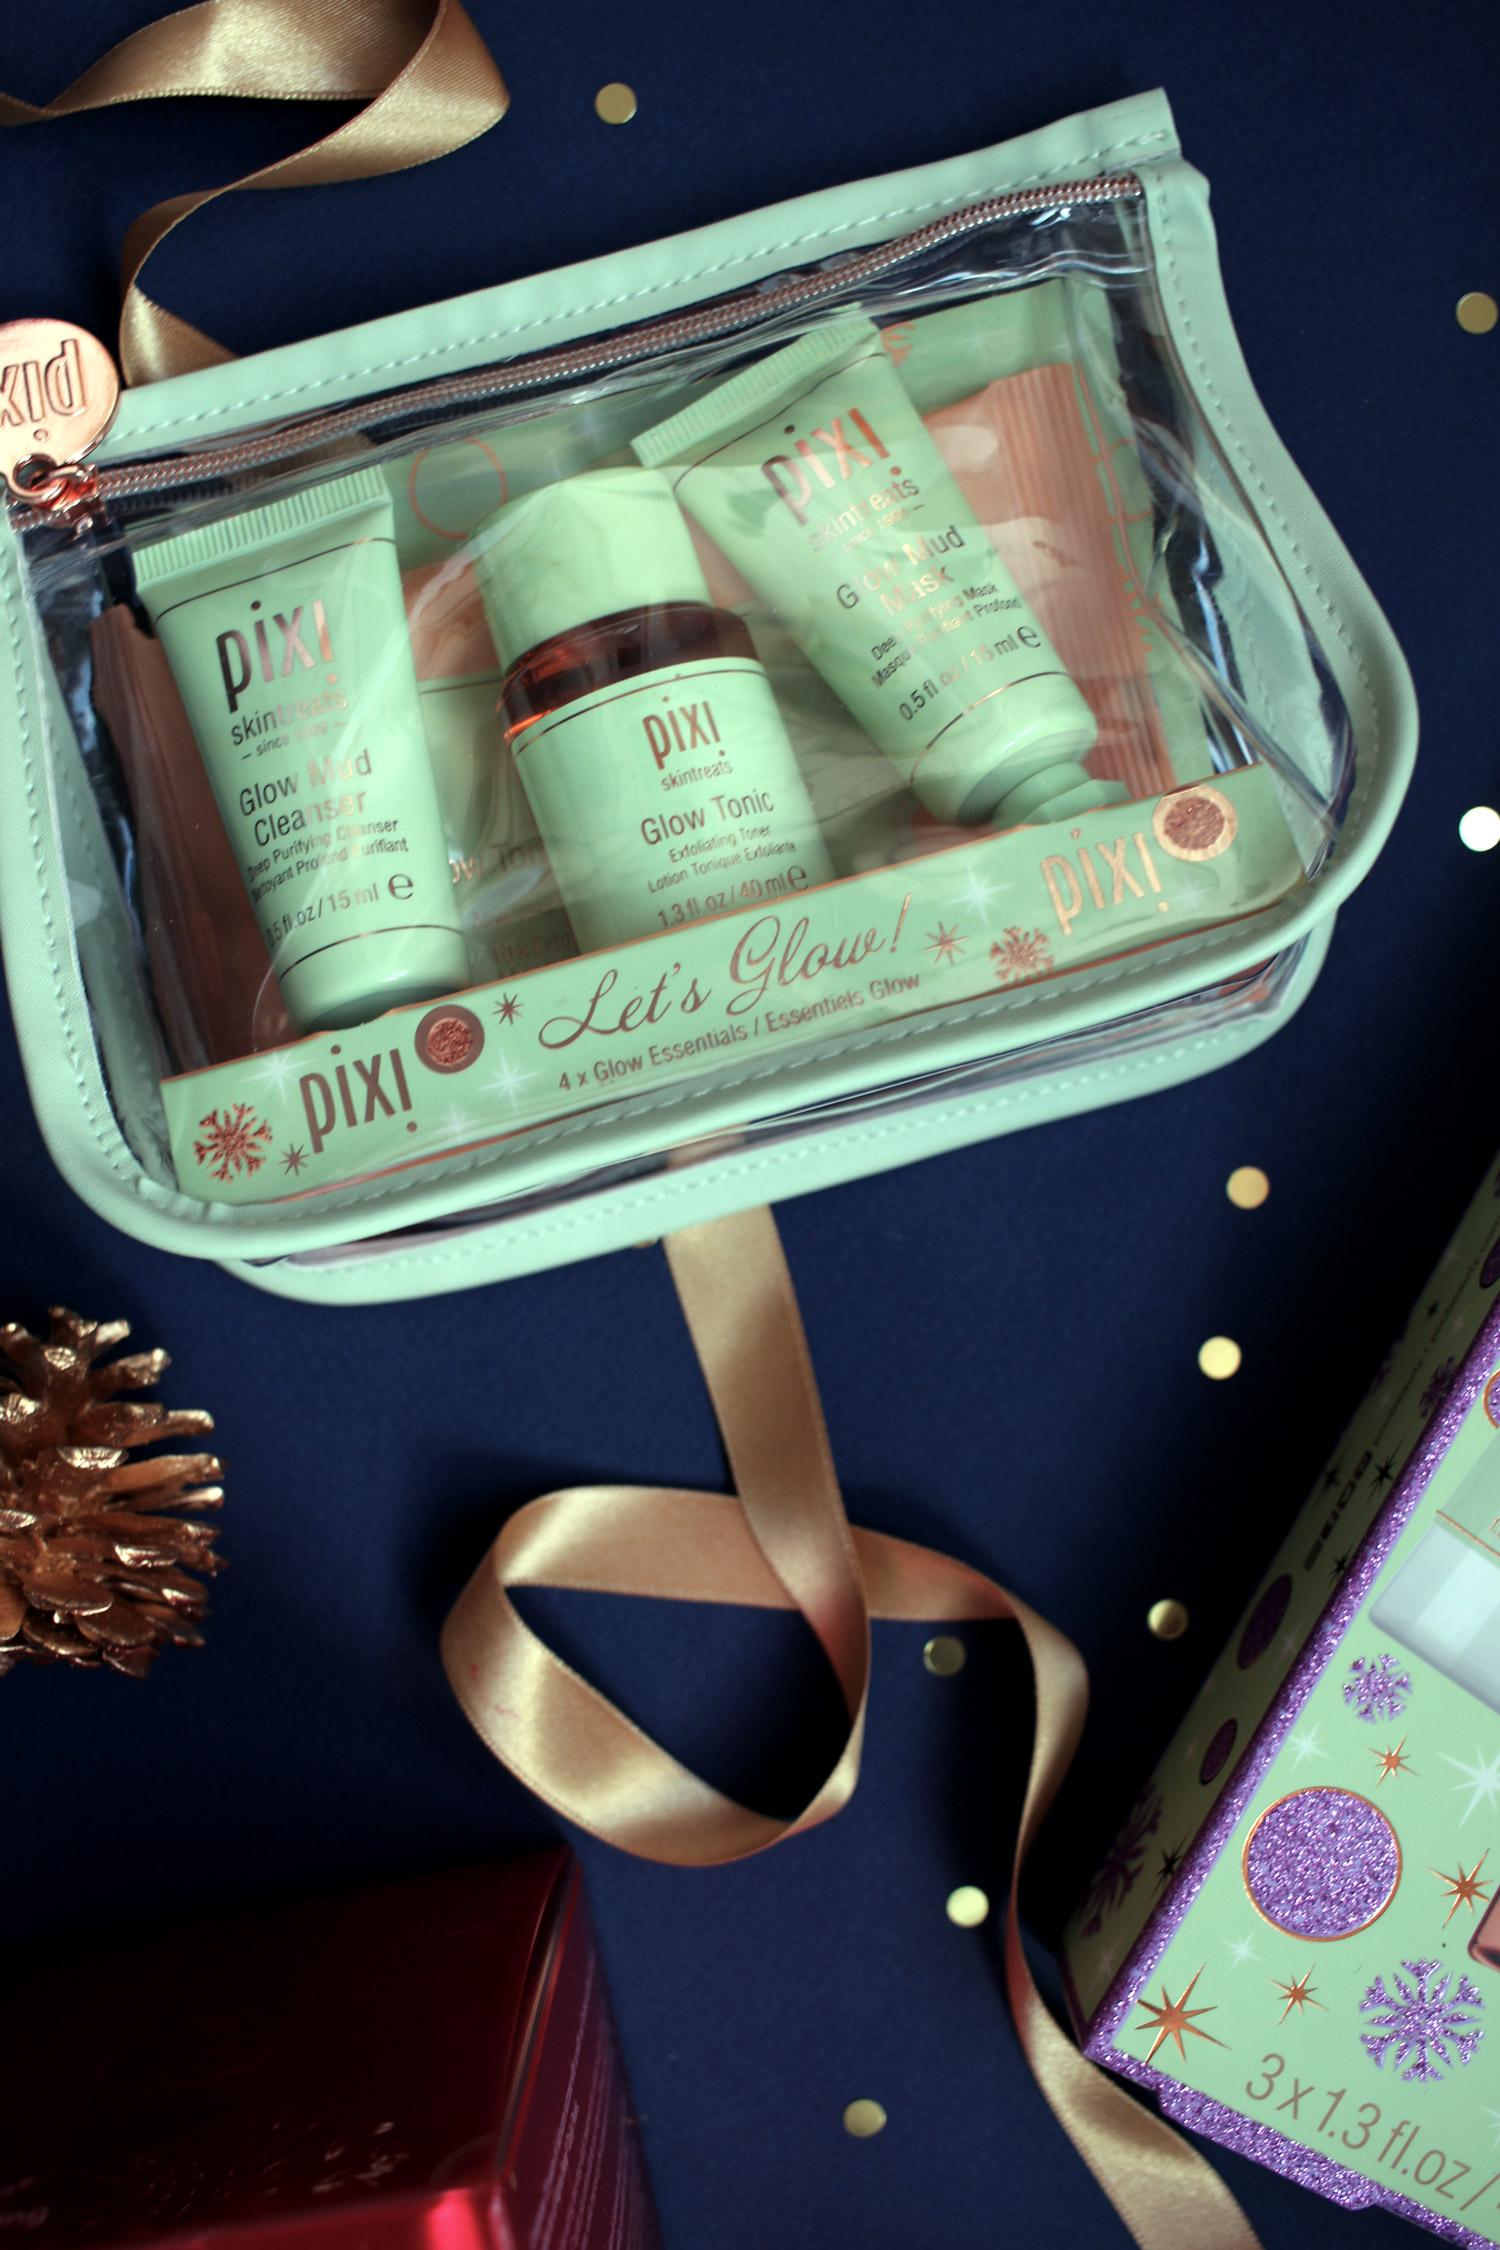 christmas-2020-beauty-gift-guide-skincare-pixi-glow-set